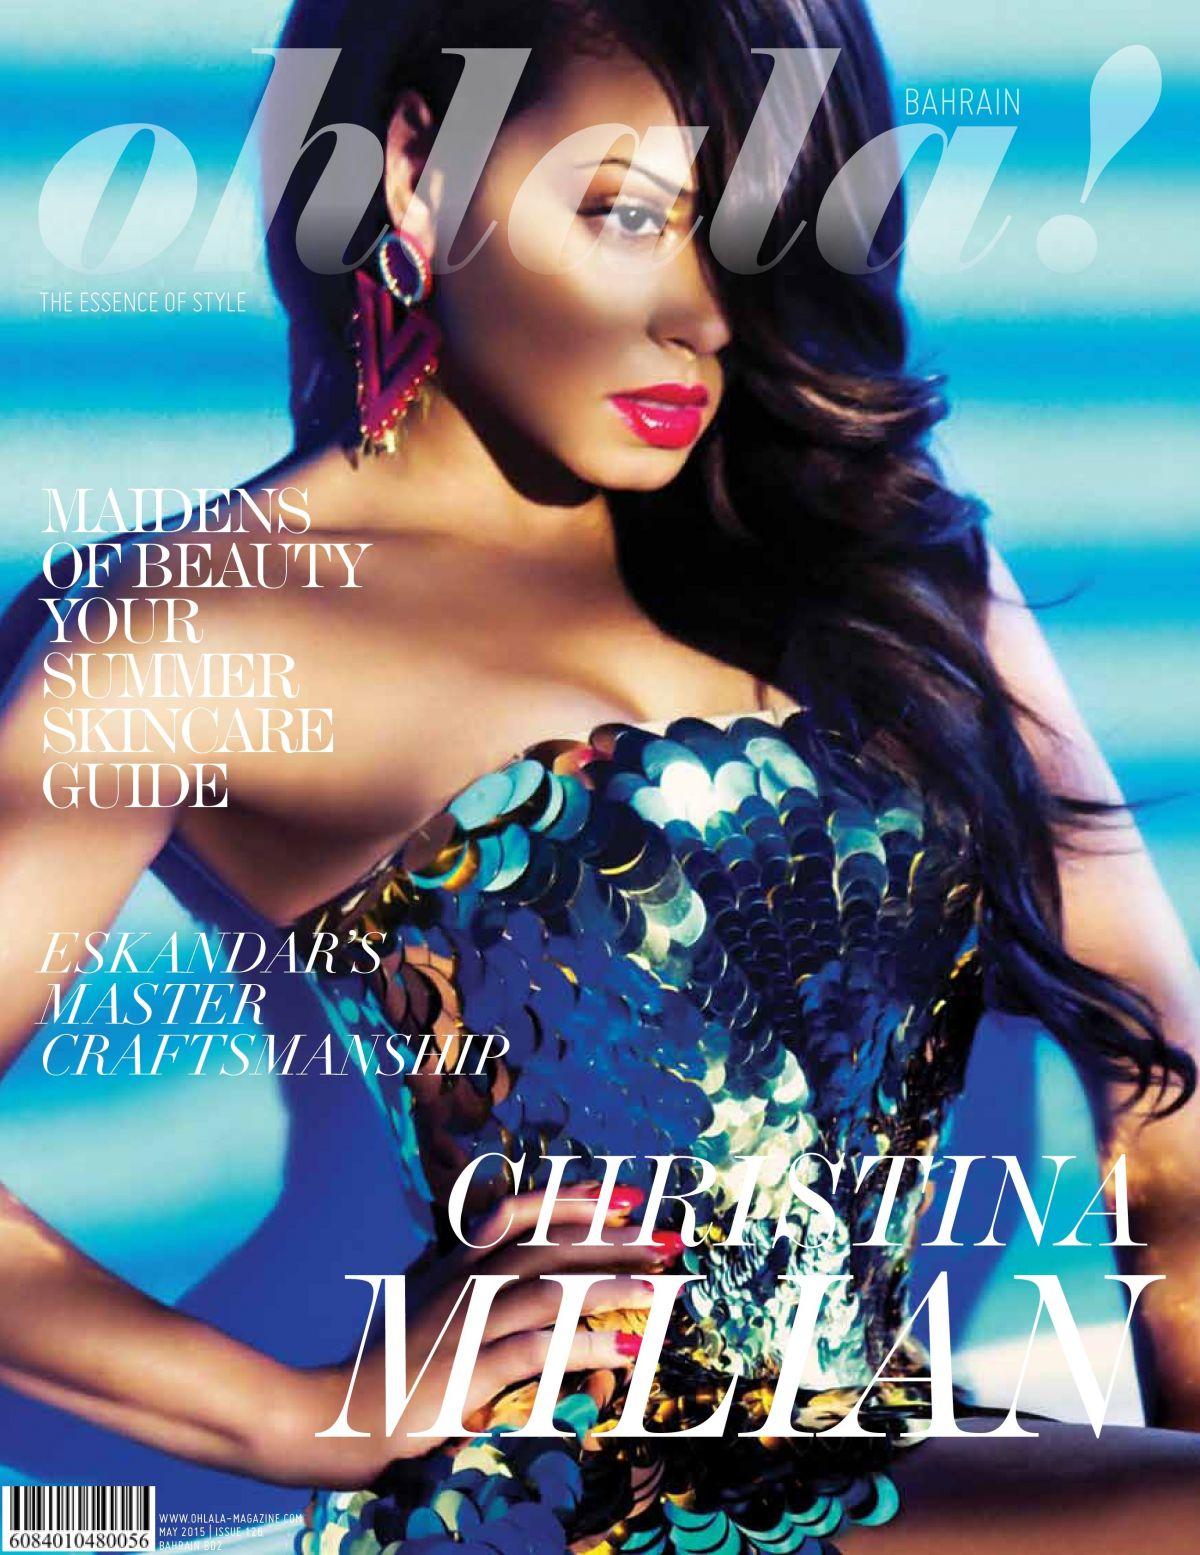 CHRISTINA MILIAN in Ohlala Magazine, May 2015 Issue